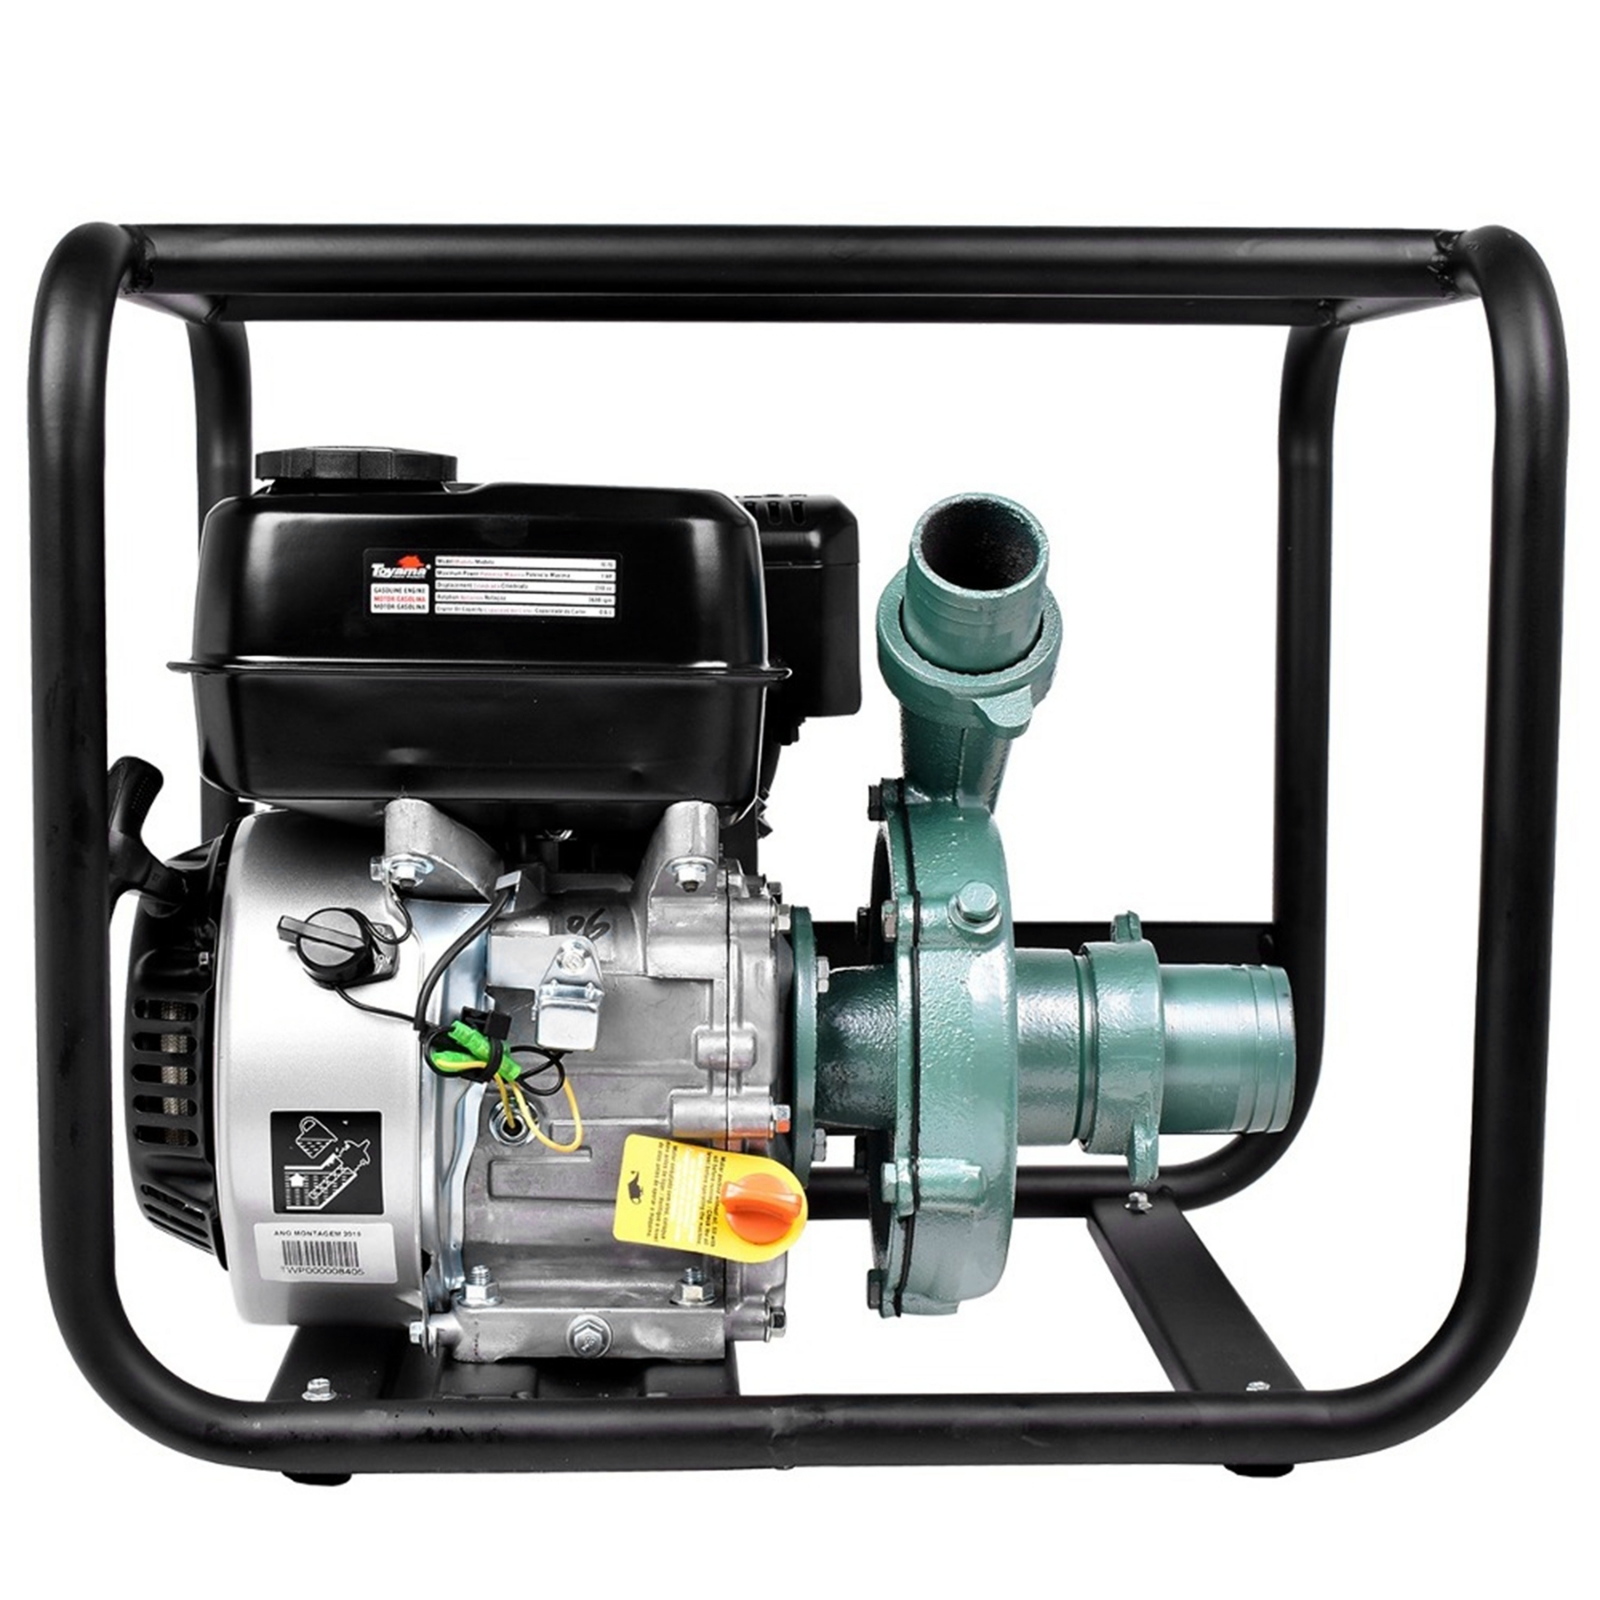 Motobomba Centrifuga a Gasolina Toyama TWP50CXP - Ferramentas MEP